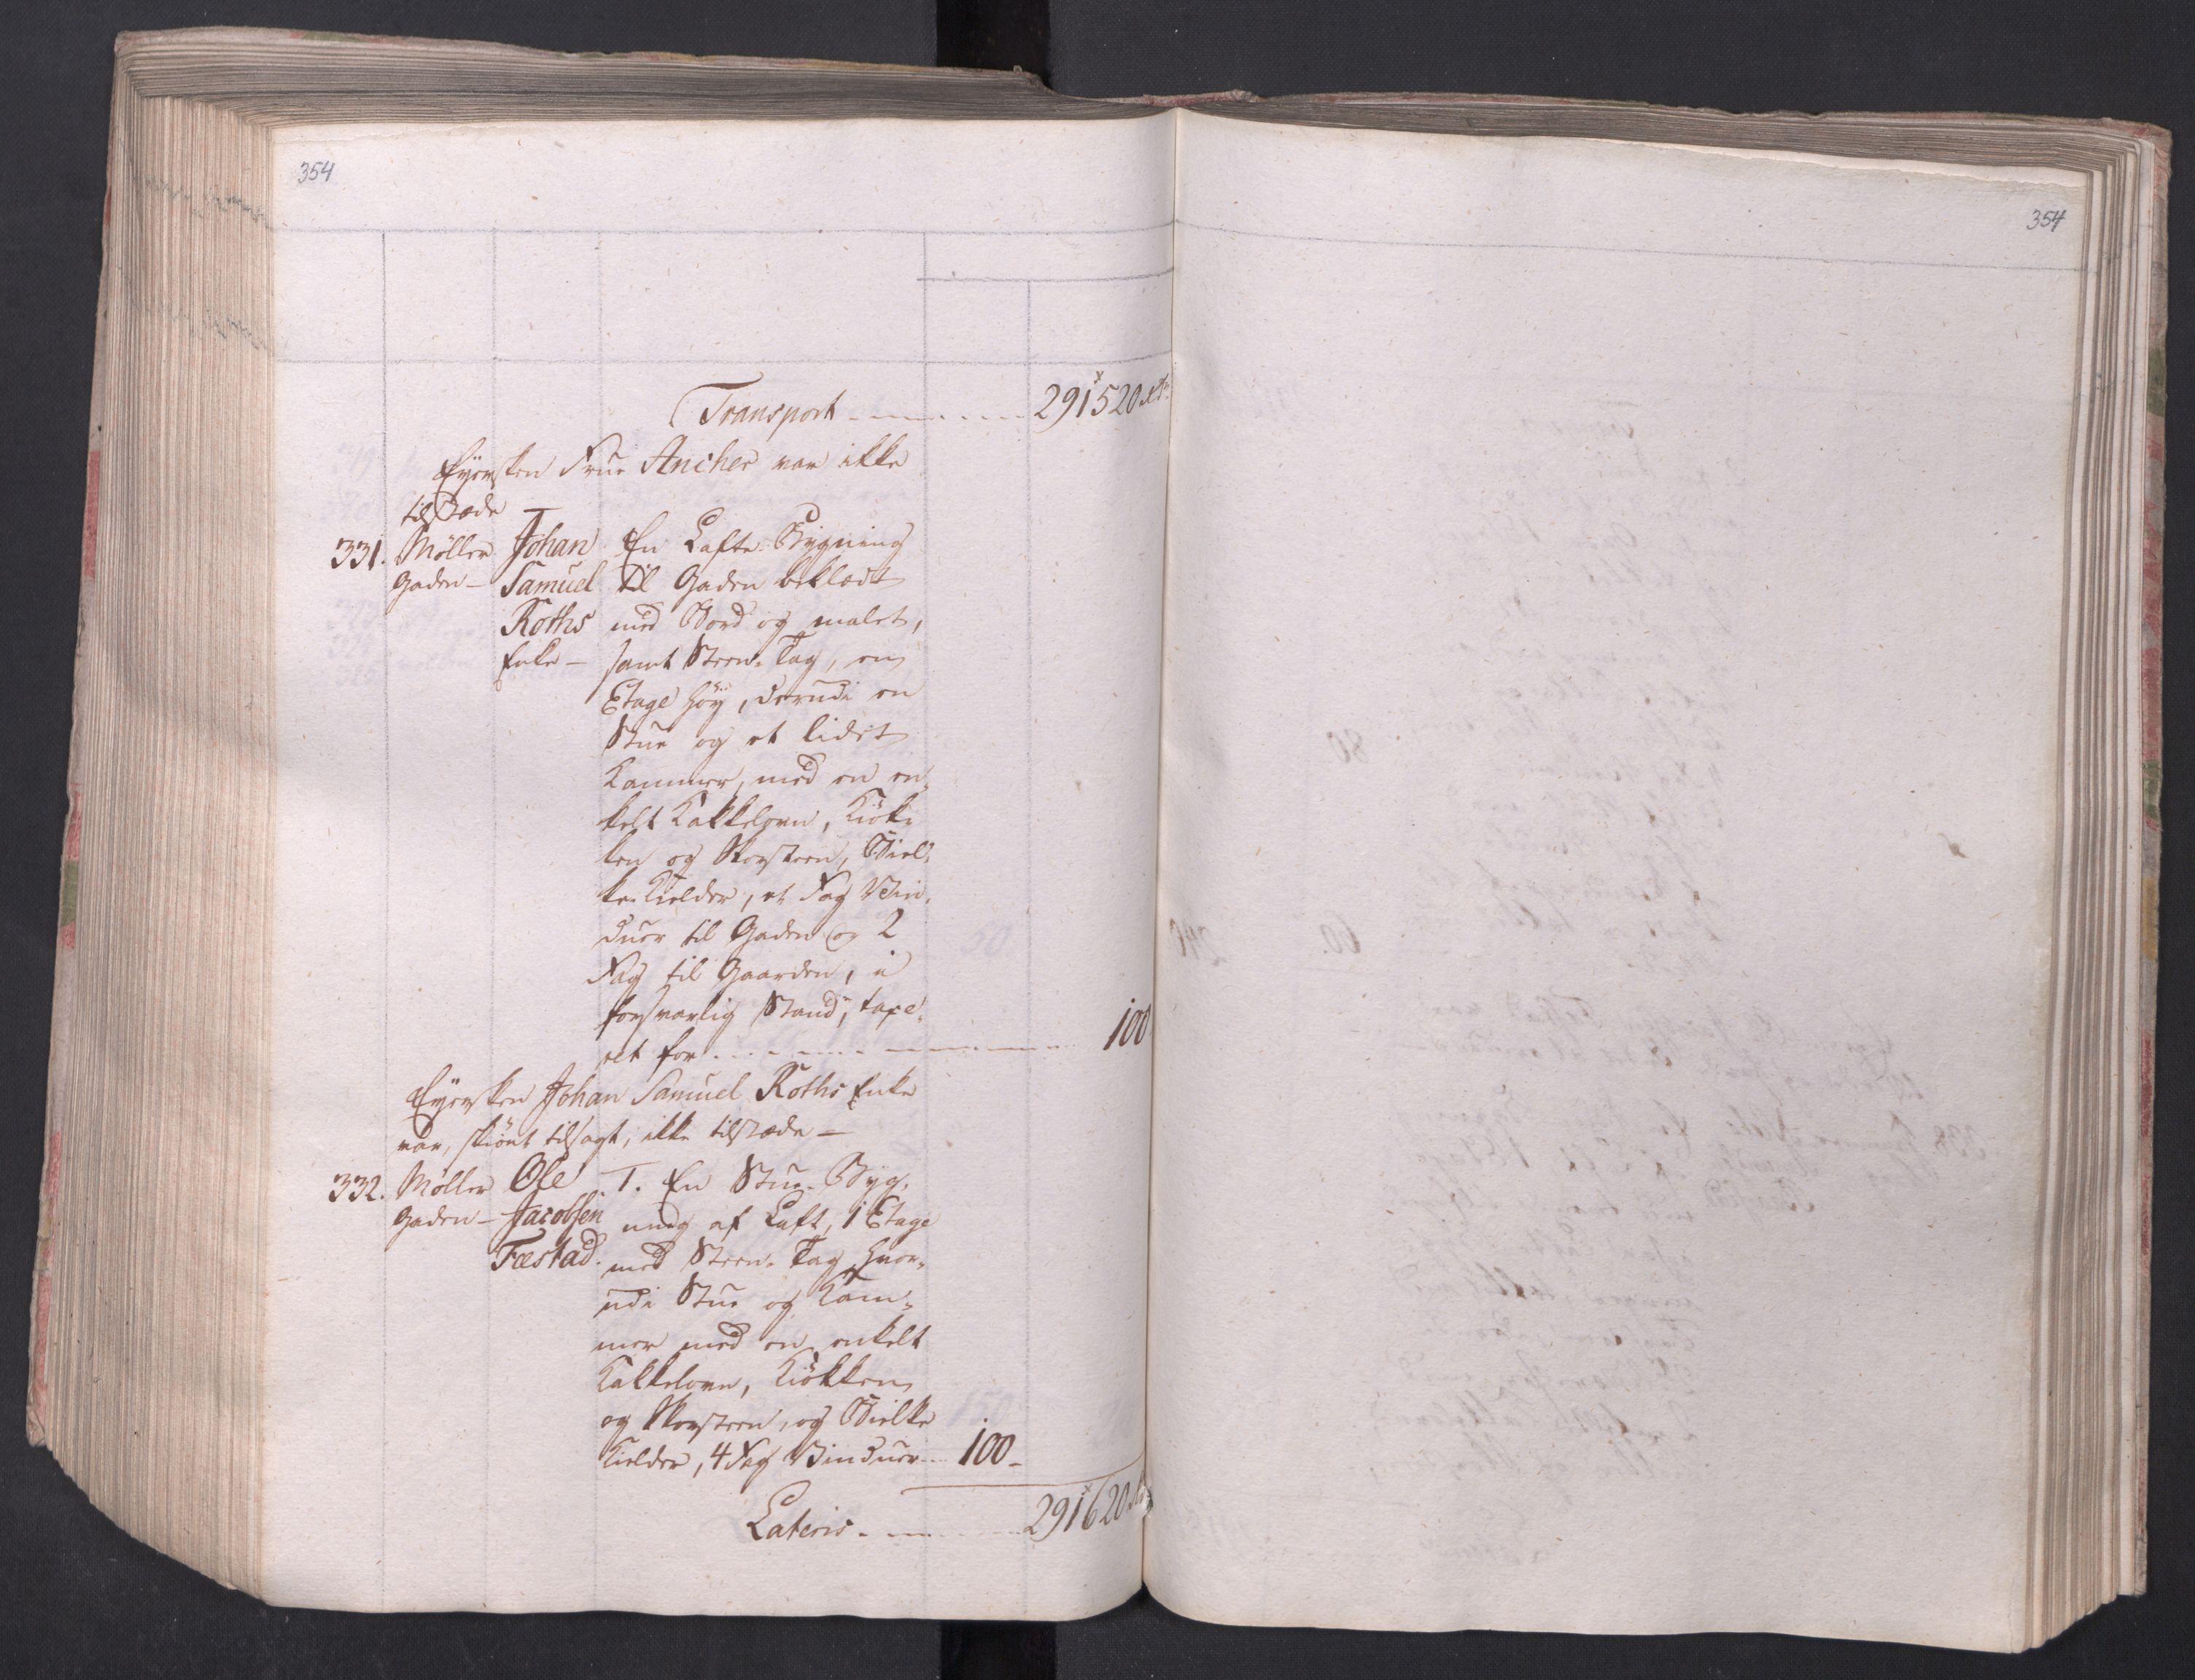 SAO, Kristiania stiftamt, I/Ia/L0015: Branntakster, 1797, s. 354